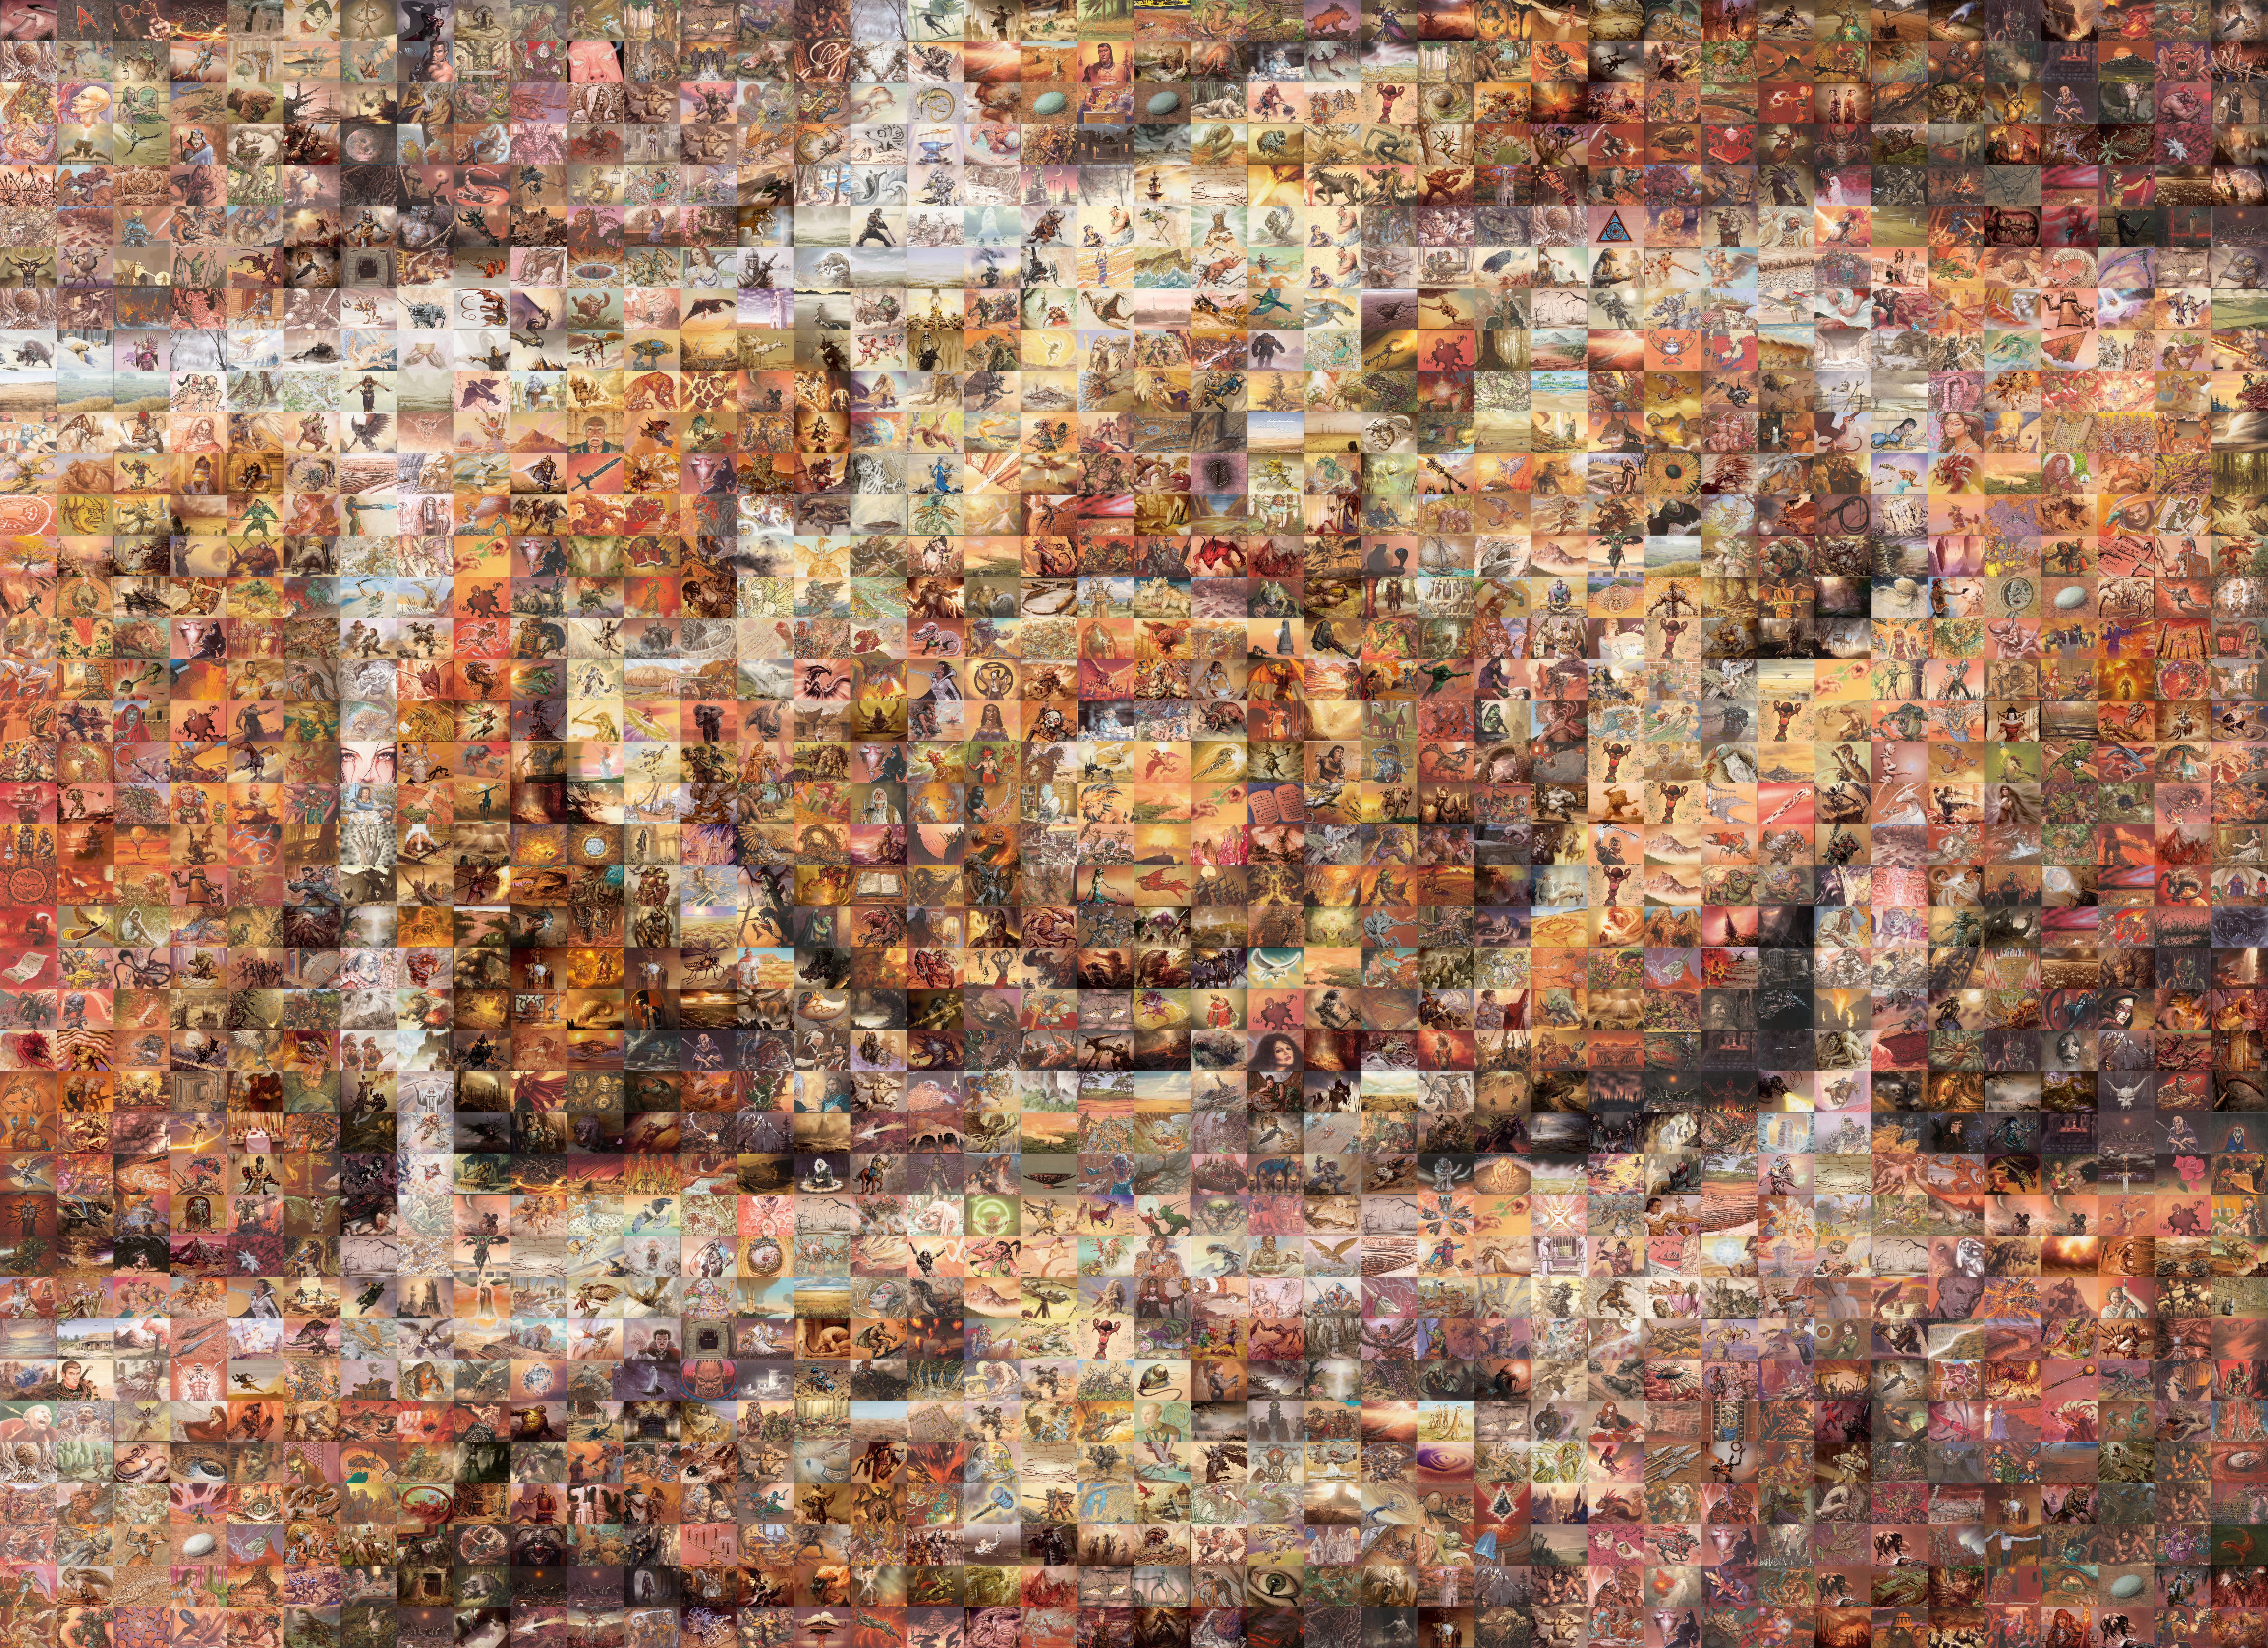 gruul-signet-mosaic